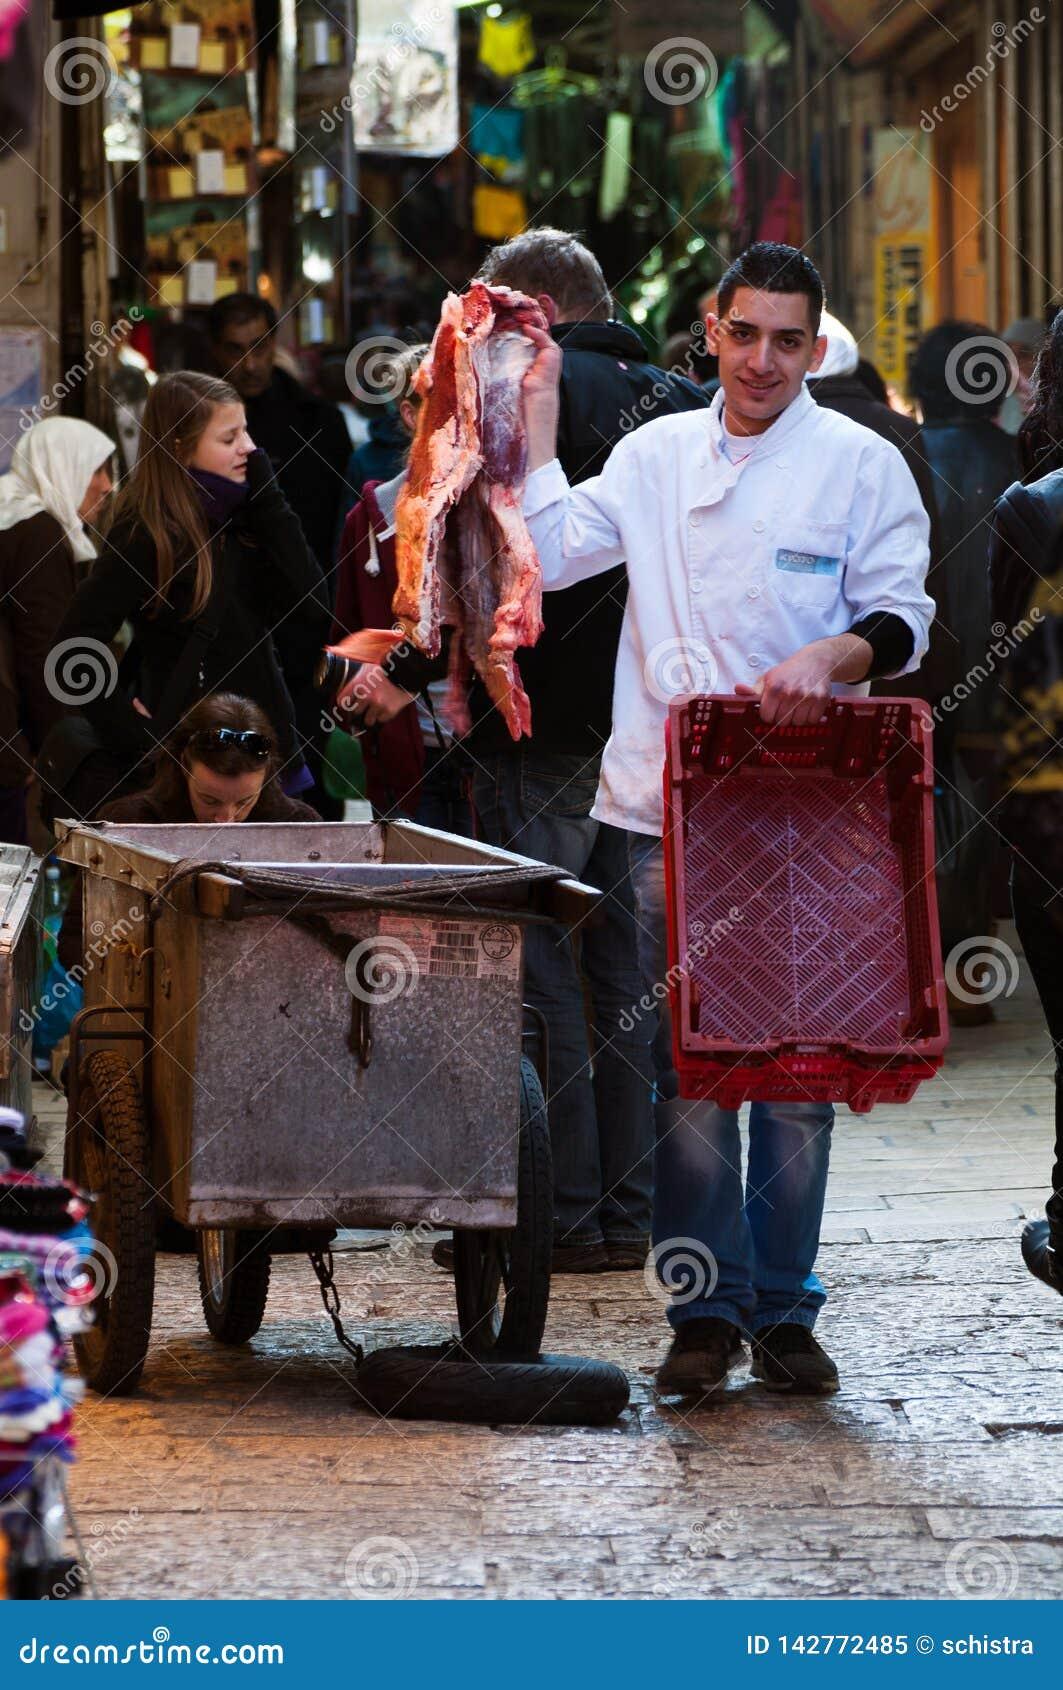 Jeruzalem, December 2012: De jonge slager wisselt vlees in Jeruzalem uit souk